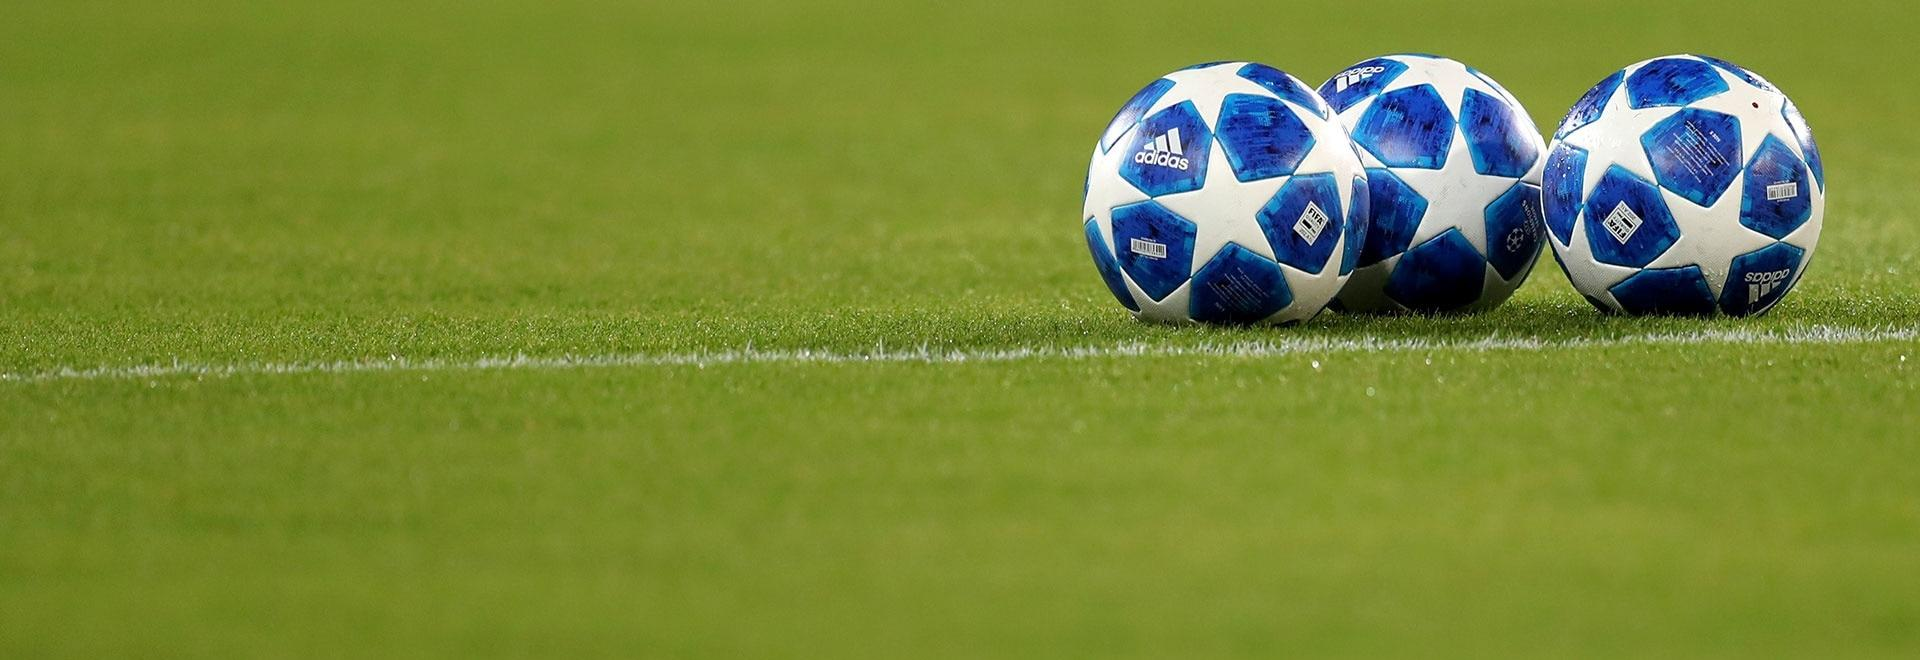 Manchester City - Borussia Dortmund 03/10/12